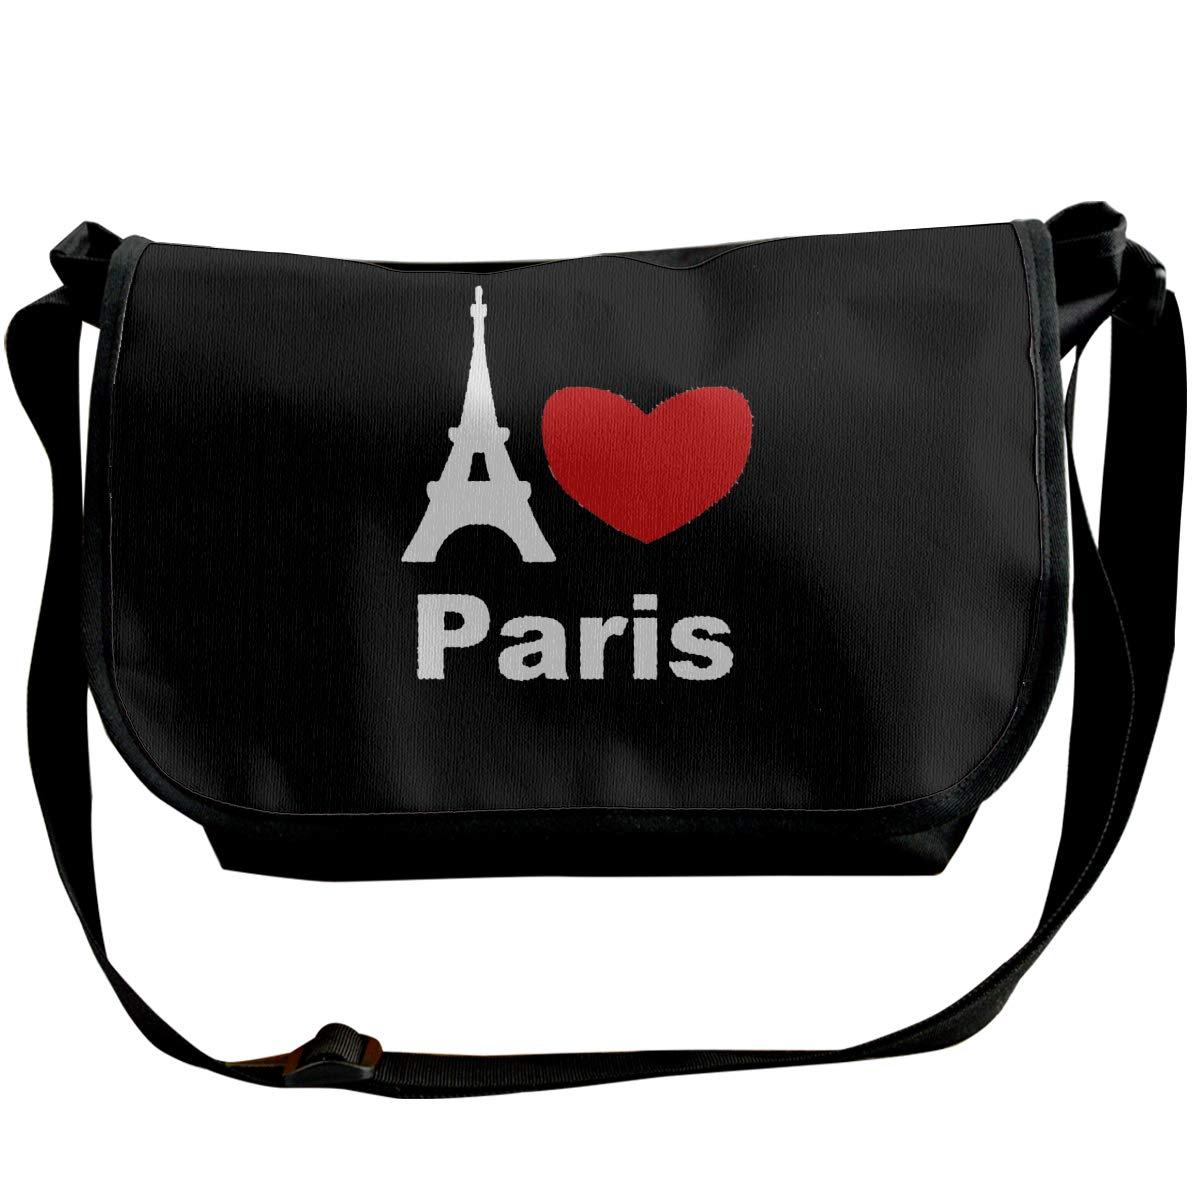 Futong Huaxia I Love Paris Travel Messenger Bags Handbag Shoulder Bag Crossbody Bag Unisex